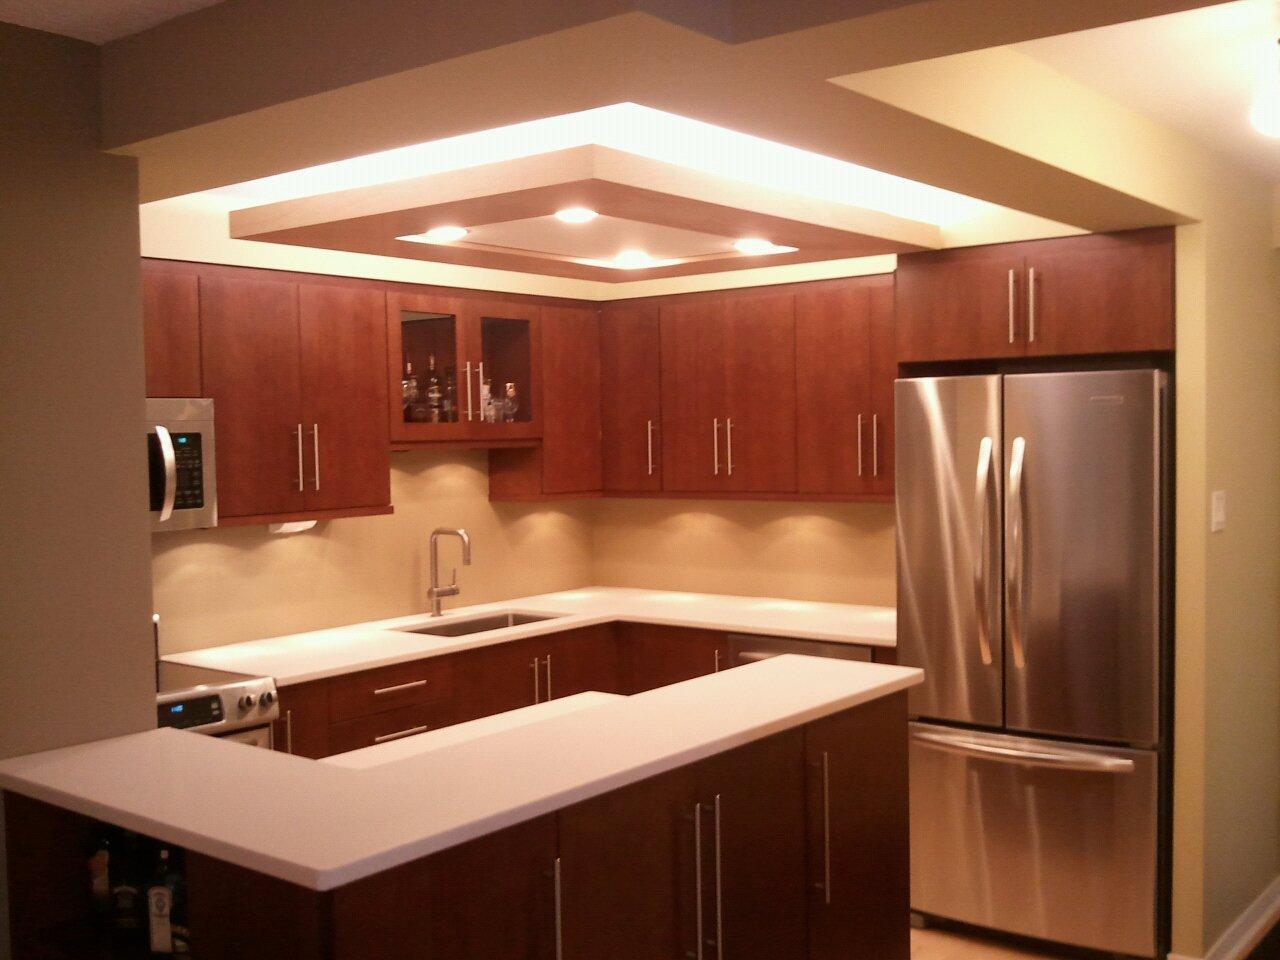 Kitchen Ceilings Designs Update Drop Ceiling Kitchen Lighting Simple Kitchen Pop Design Simple False Ceiling Designs For Kitchen Interior Design Center Inspiration